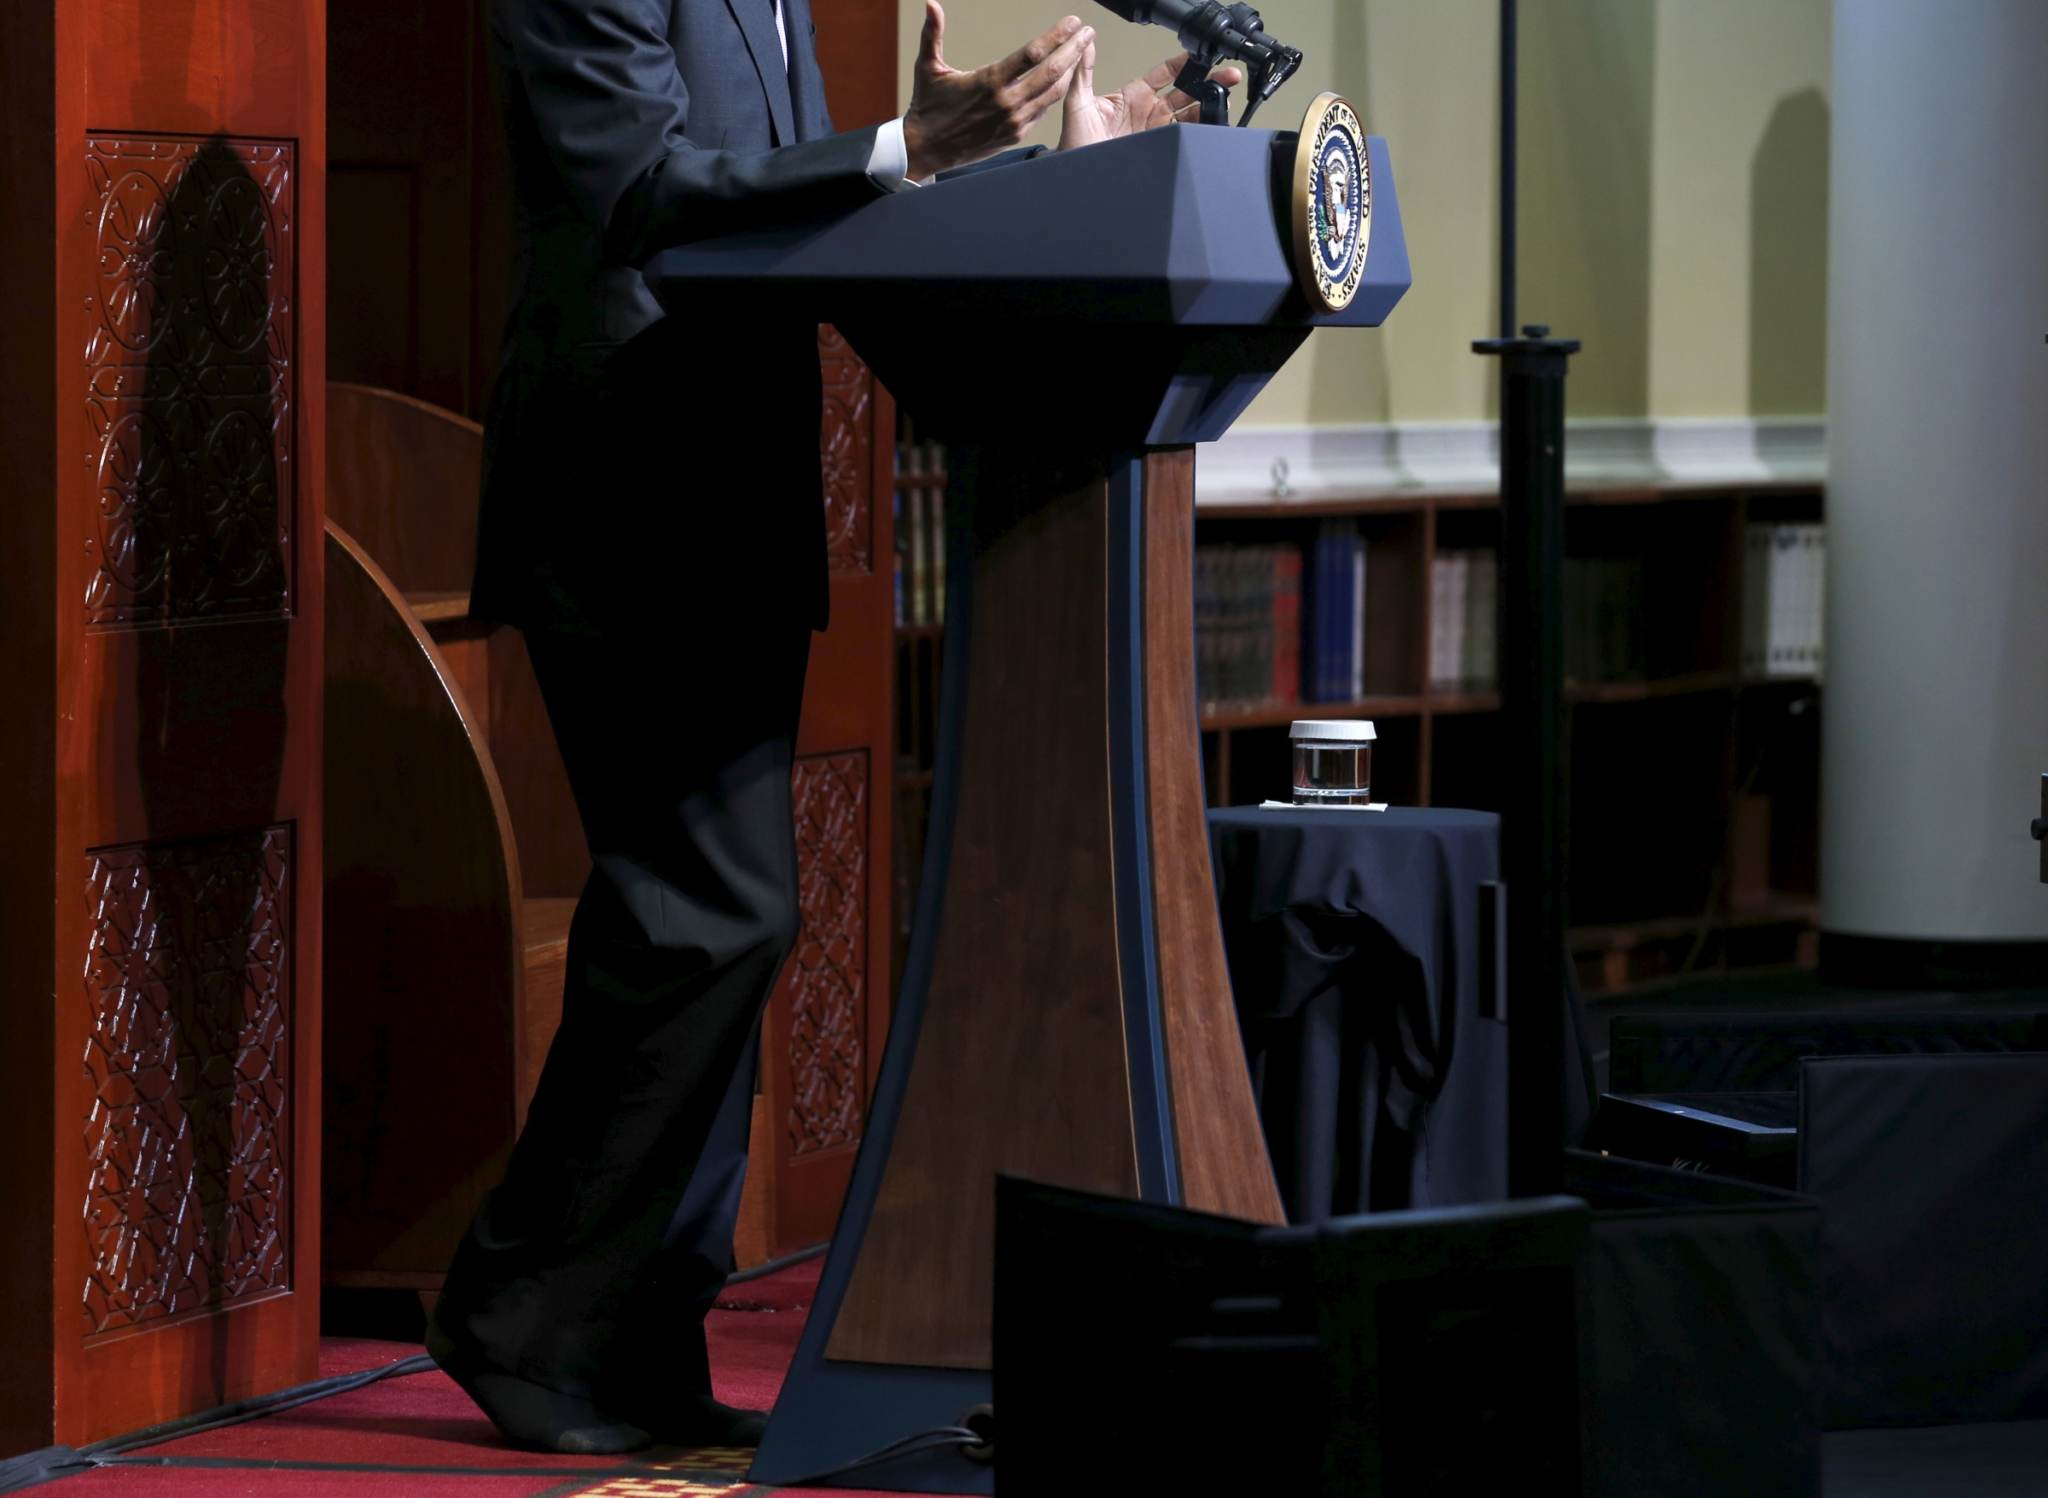 Sokkides Obama islami asju arutamas. Foto: Jonathan Ernst, Reuters/Scanpix